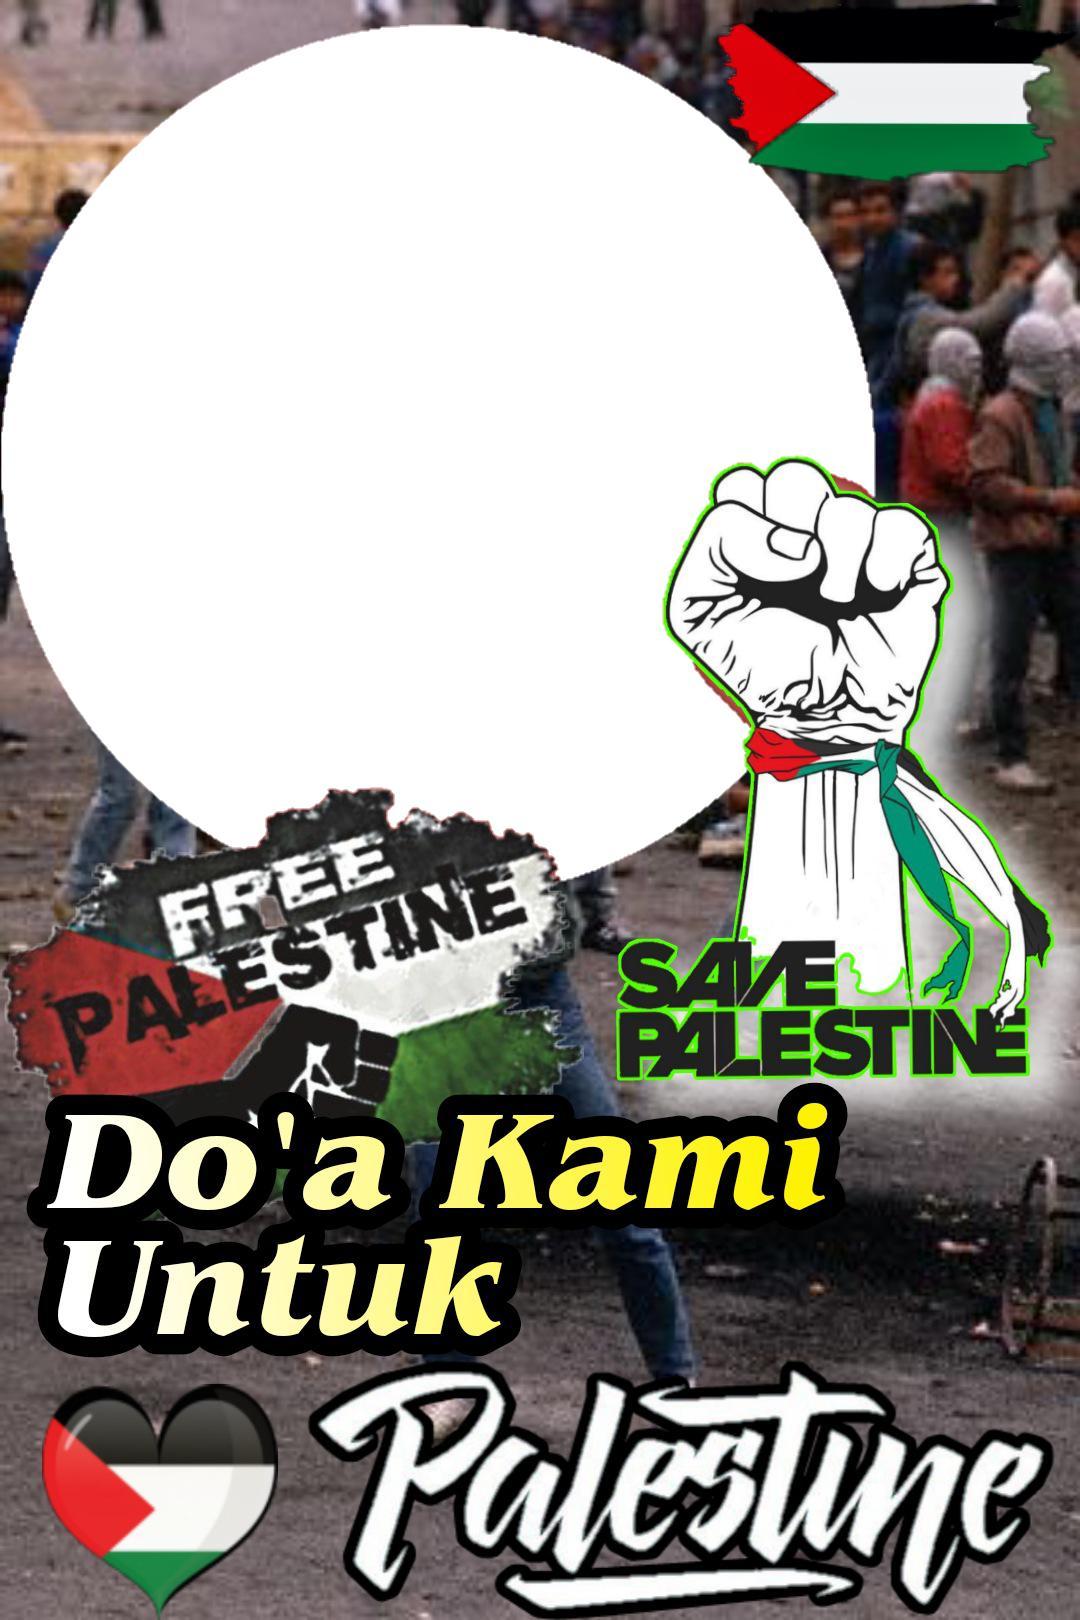 Download Twibbon Save Palestina untuk Istragram